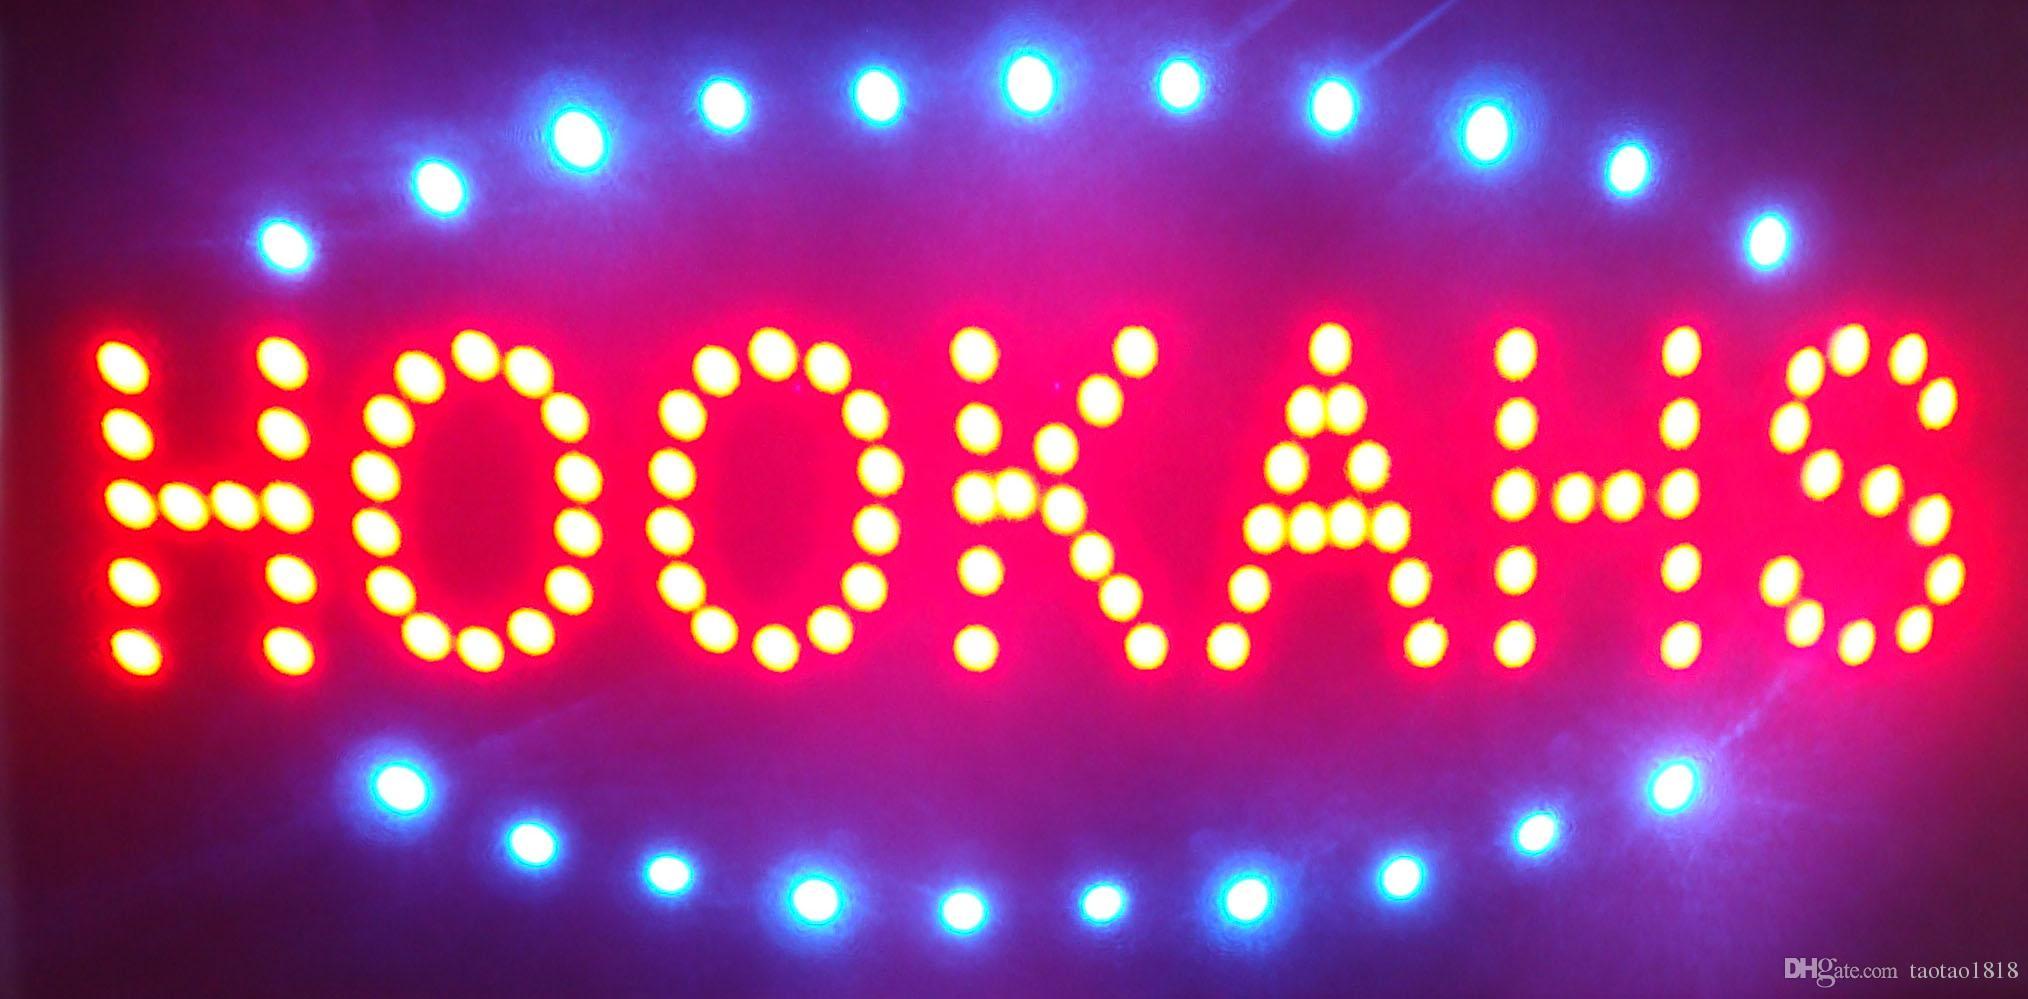 LED Hookahs 표시 플라스틱 PVC 프레임 표시 크기 10cm * 19cm 인치